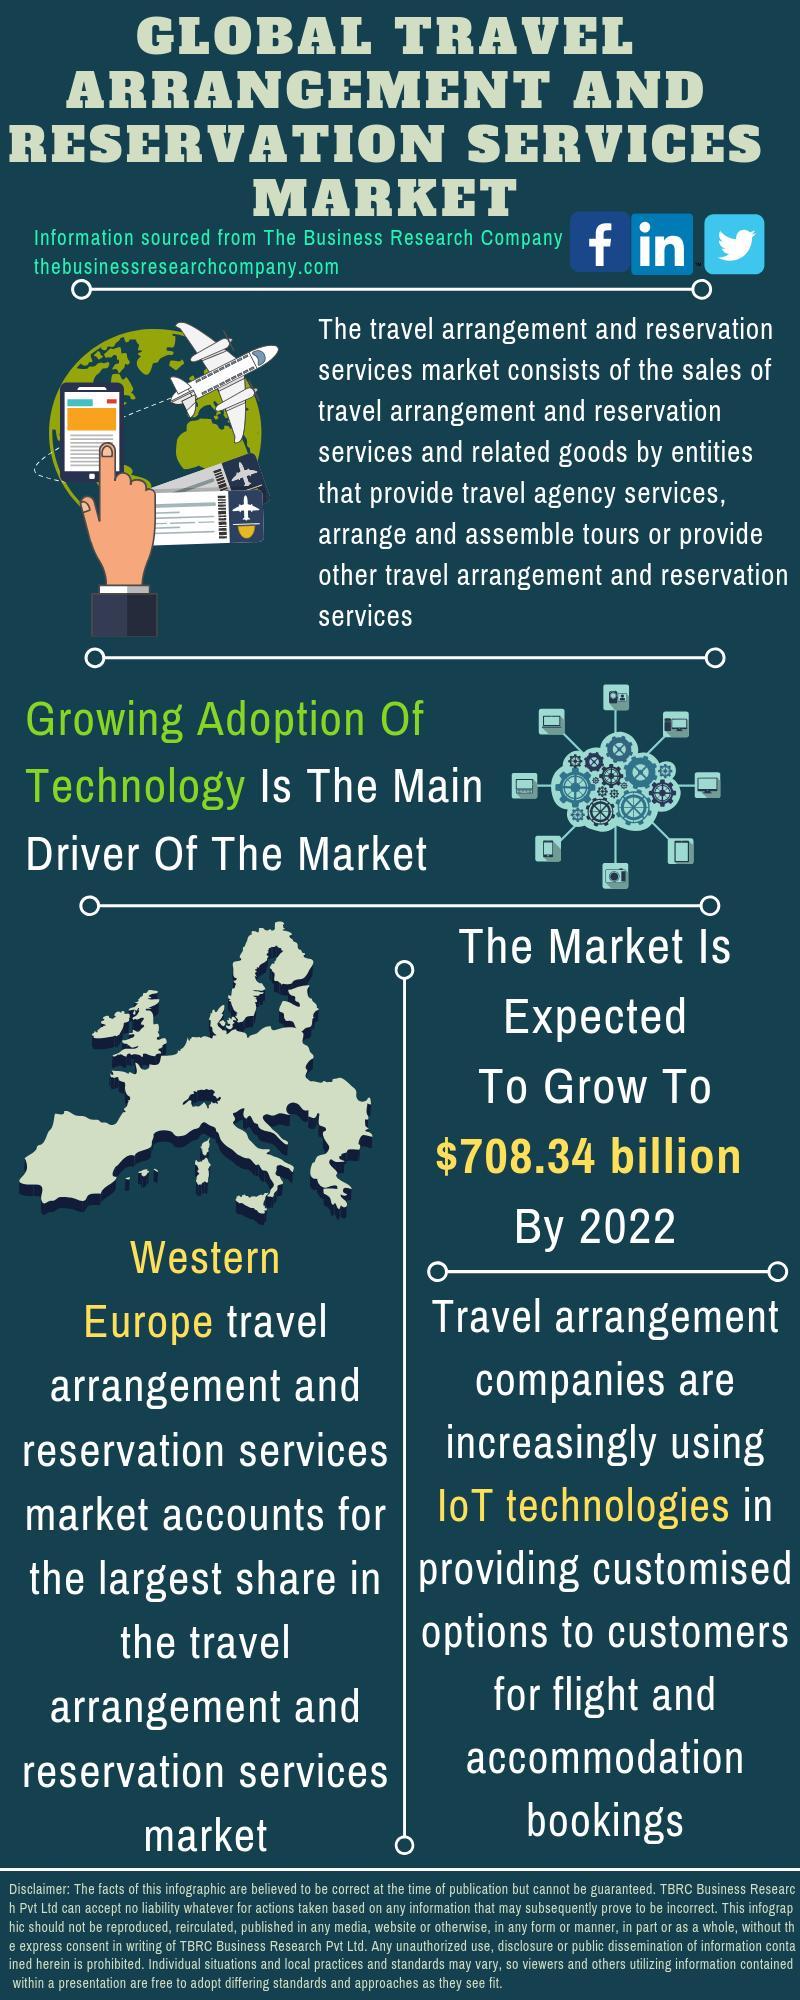 Travel Arrangement And Reservation Services Market